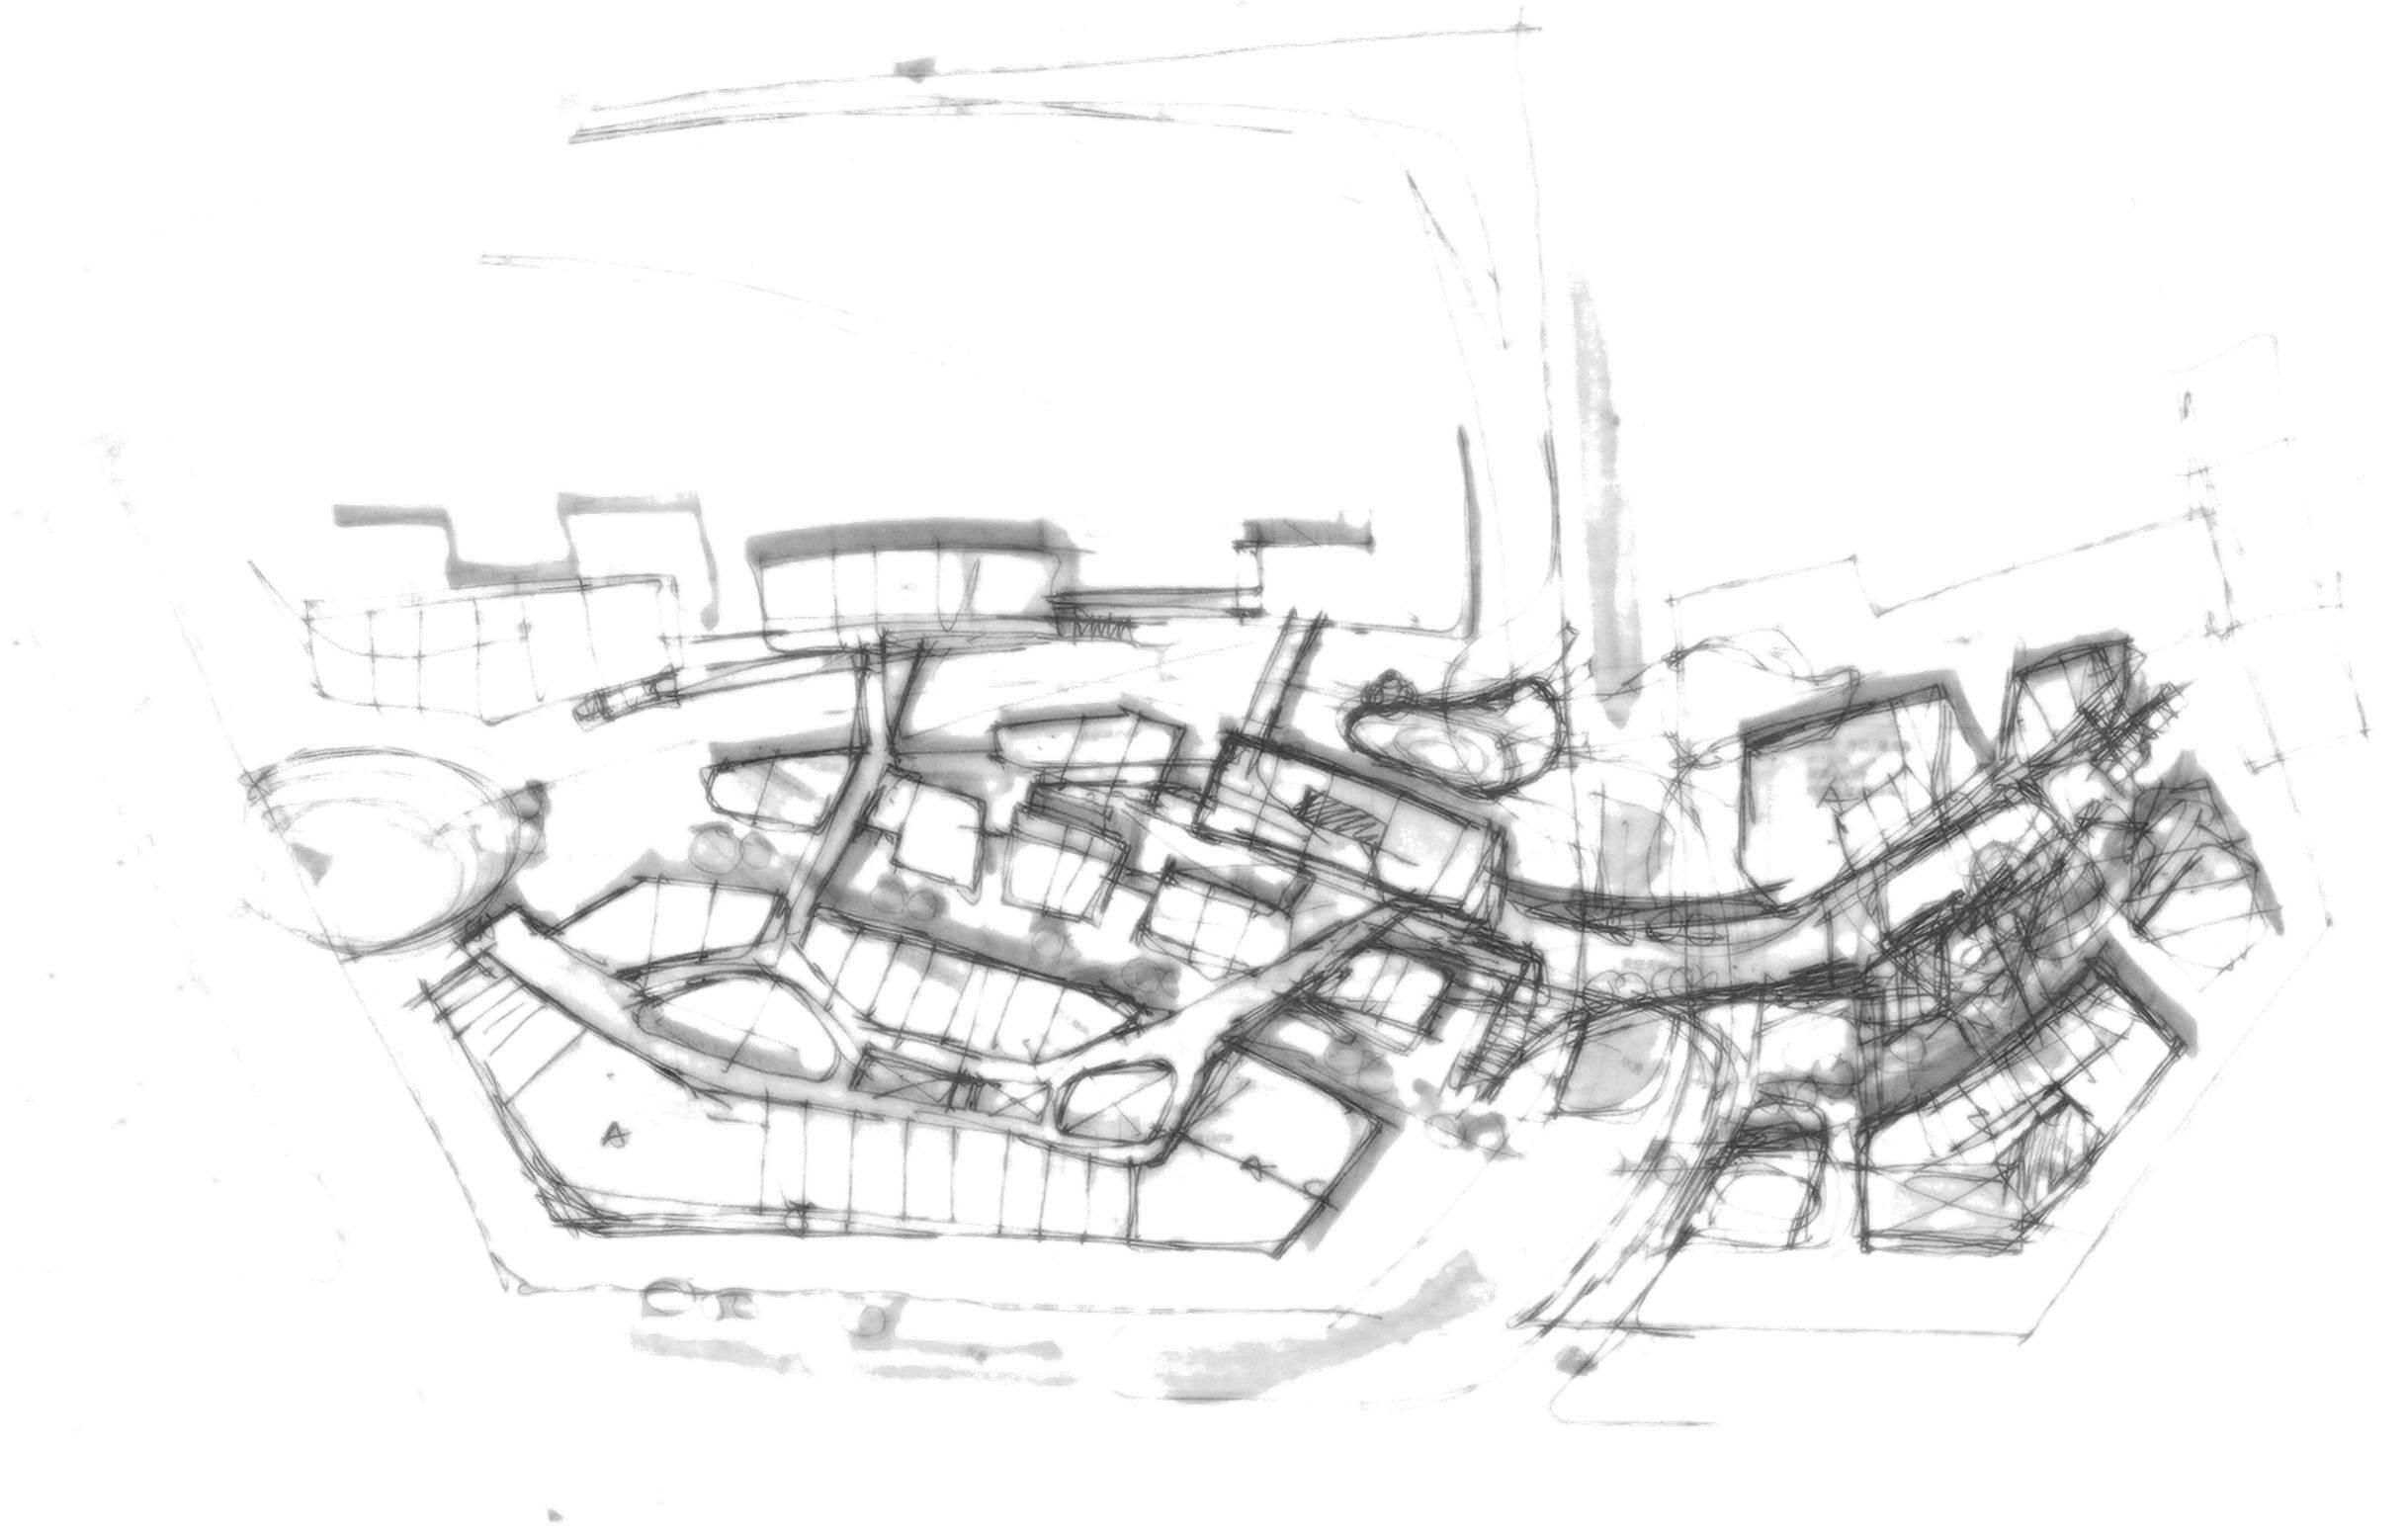 2436x1554 Retail Plan Concept Architecture Sketches L Randy Carizo